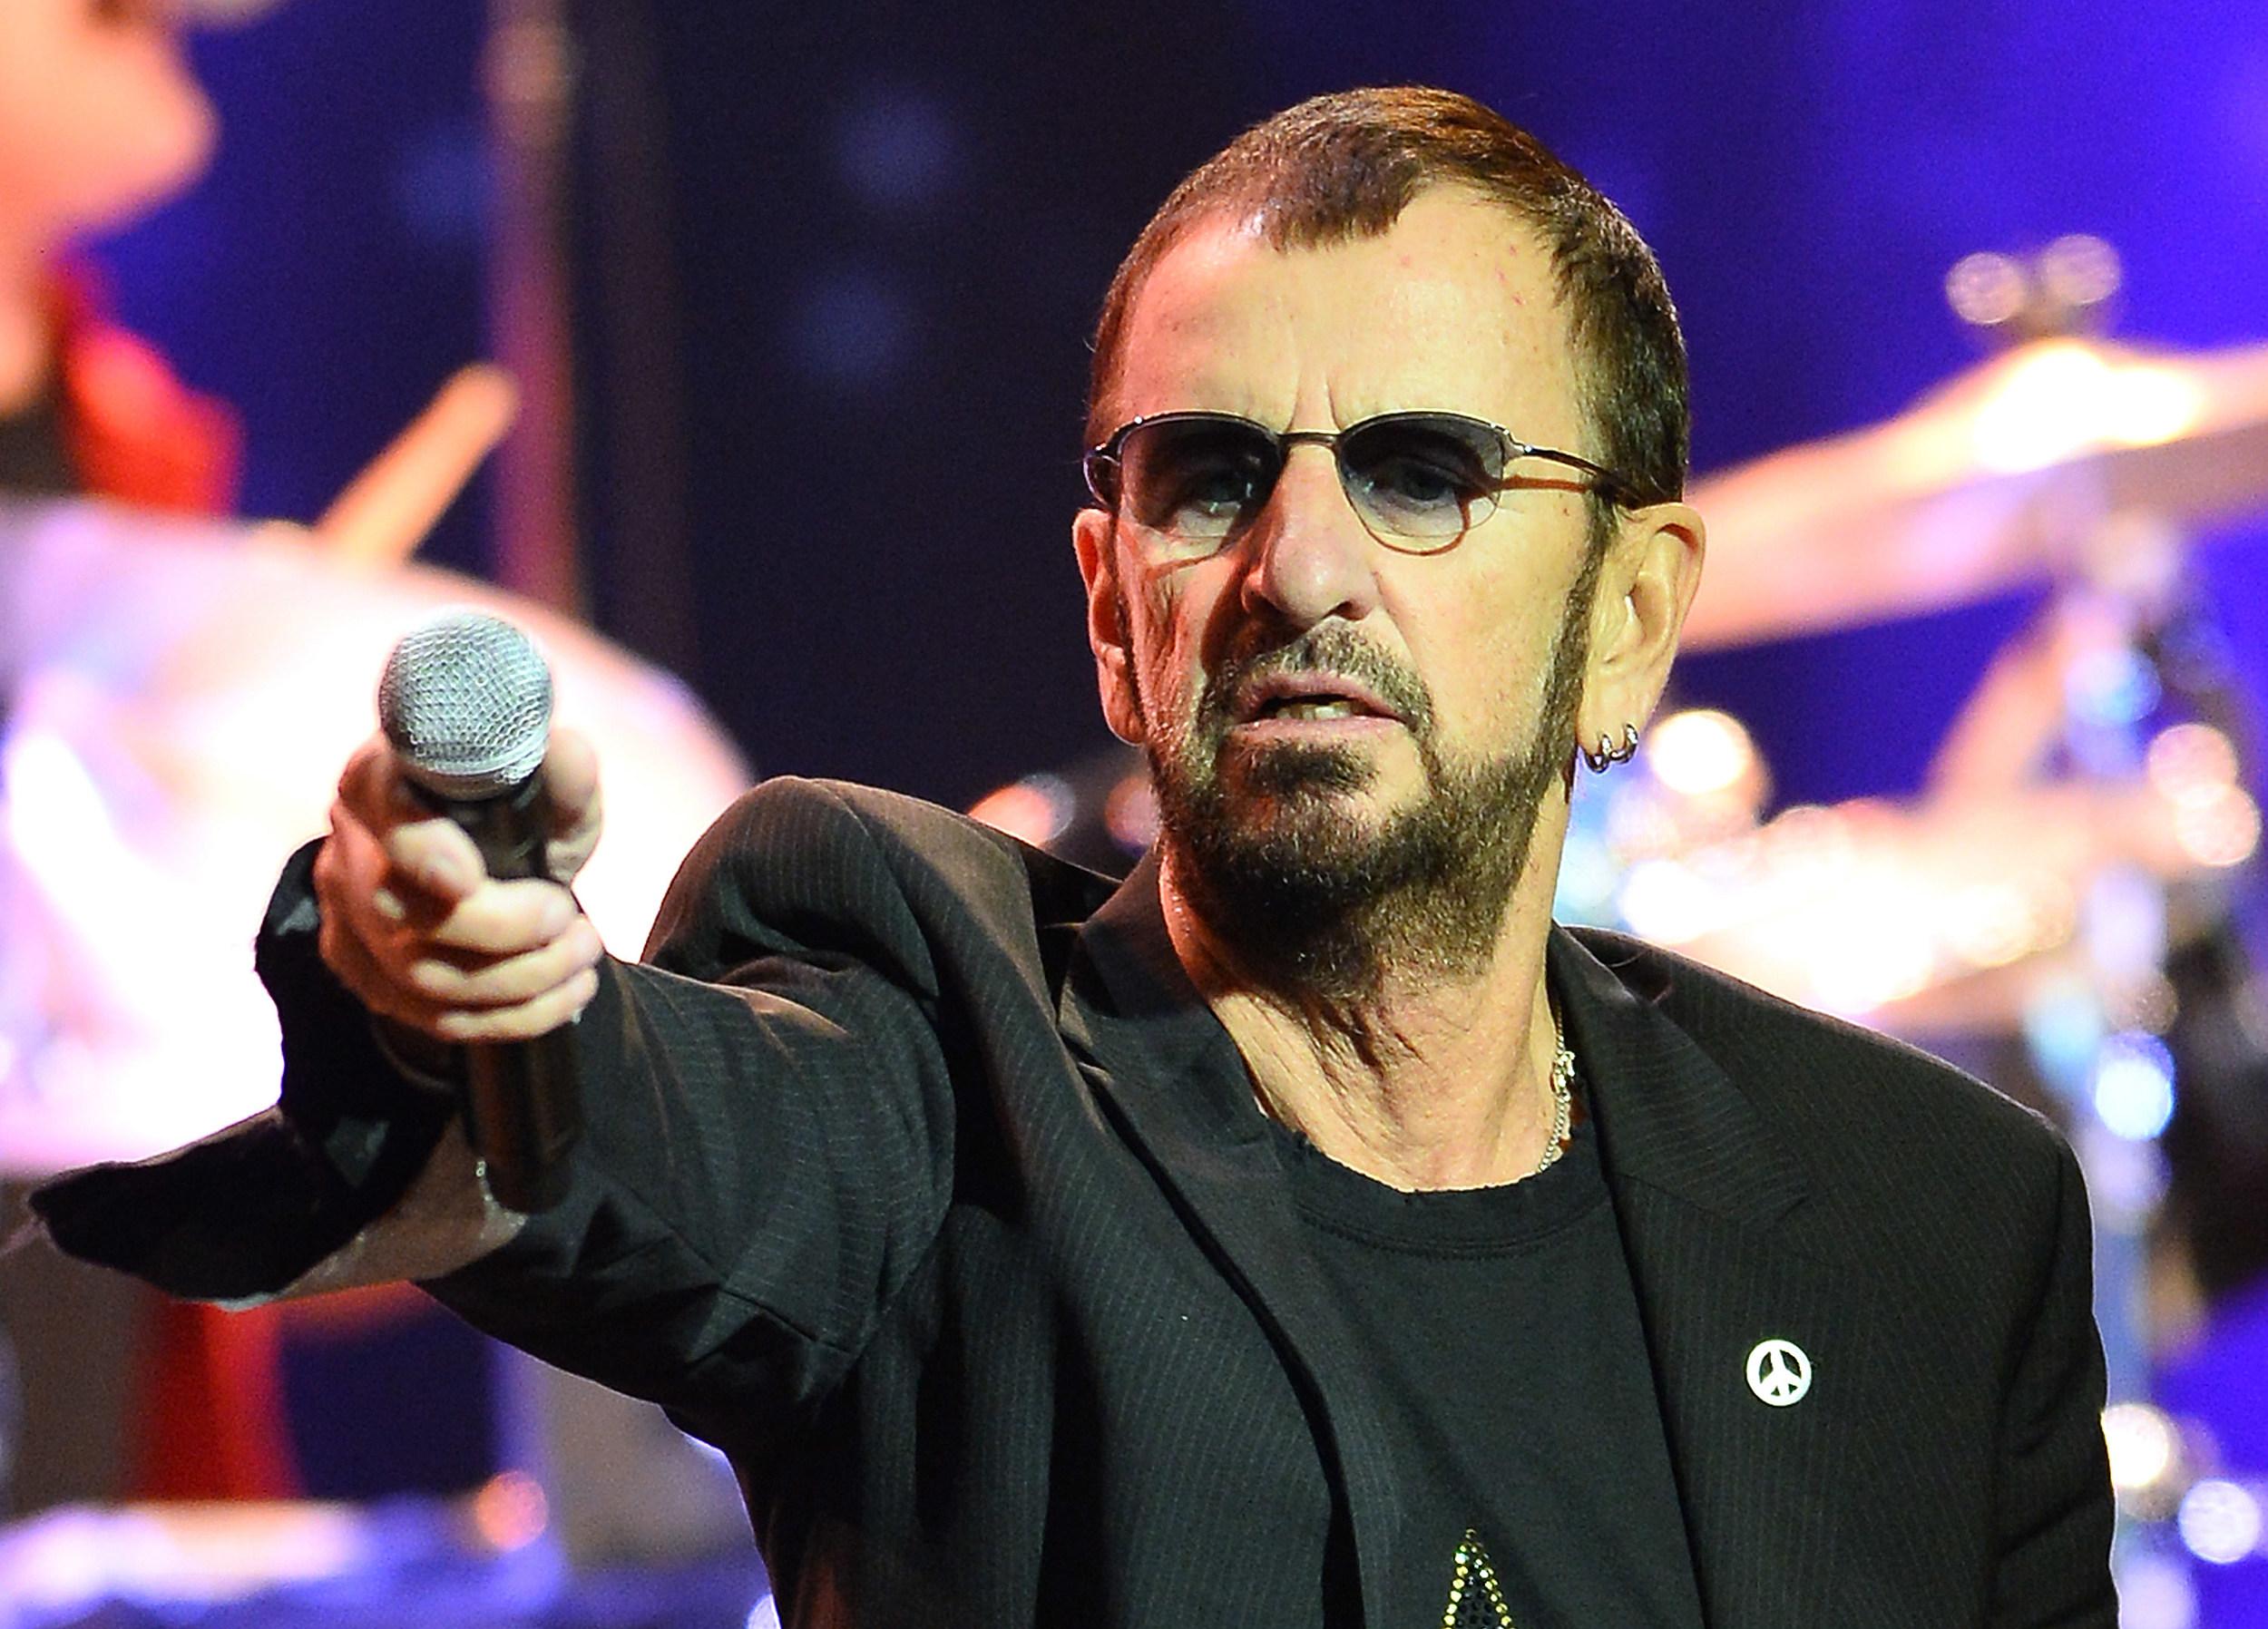 Ringo Starr kicks off tour in Las Vegas in October